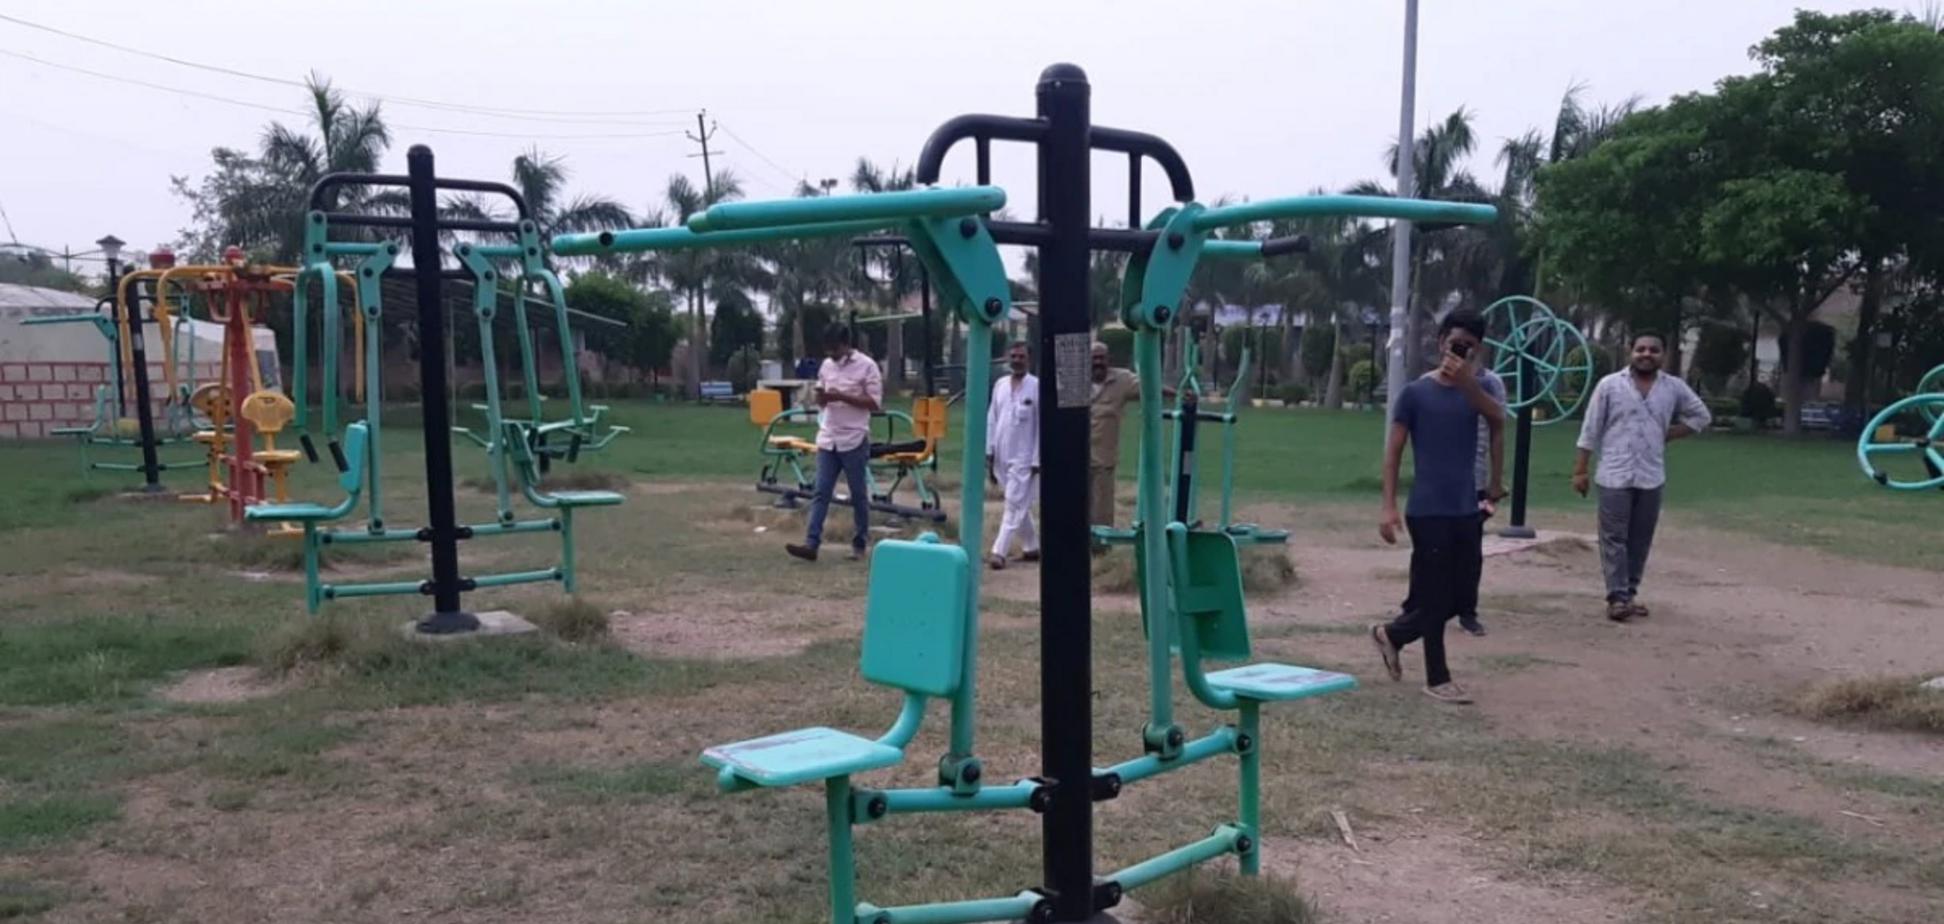 Тренажер в Индии, на котором заподозрили призрак